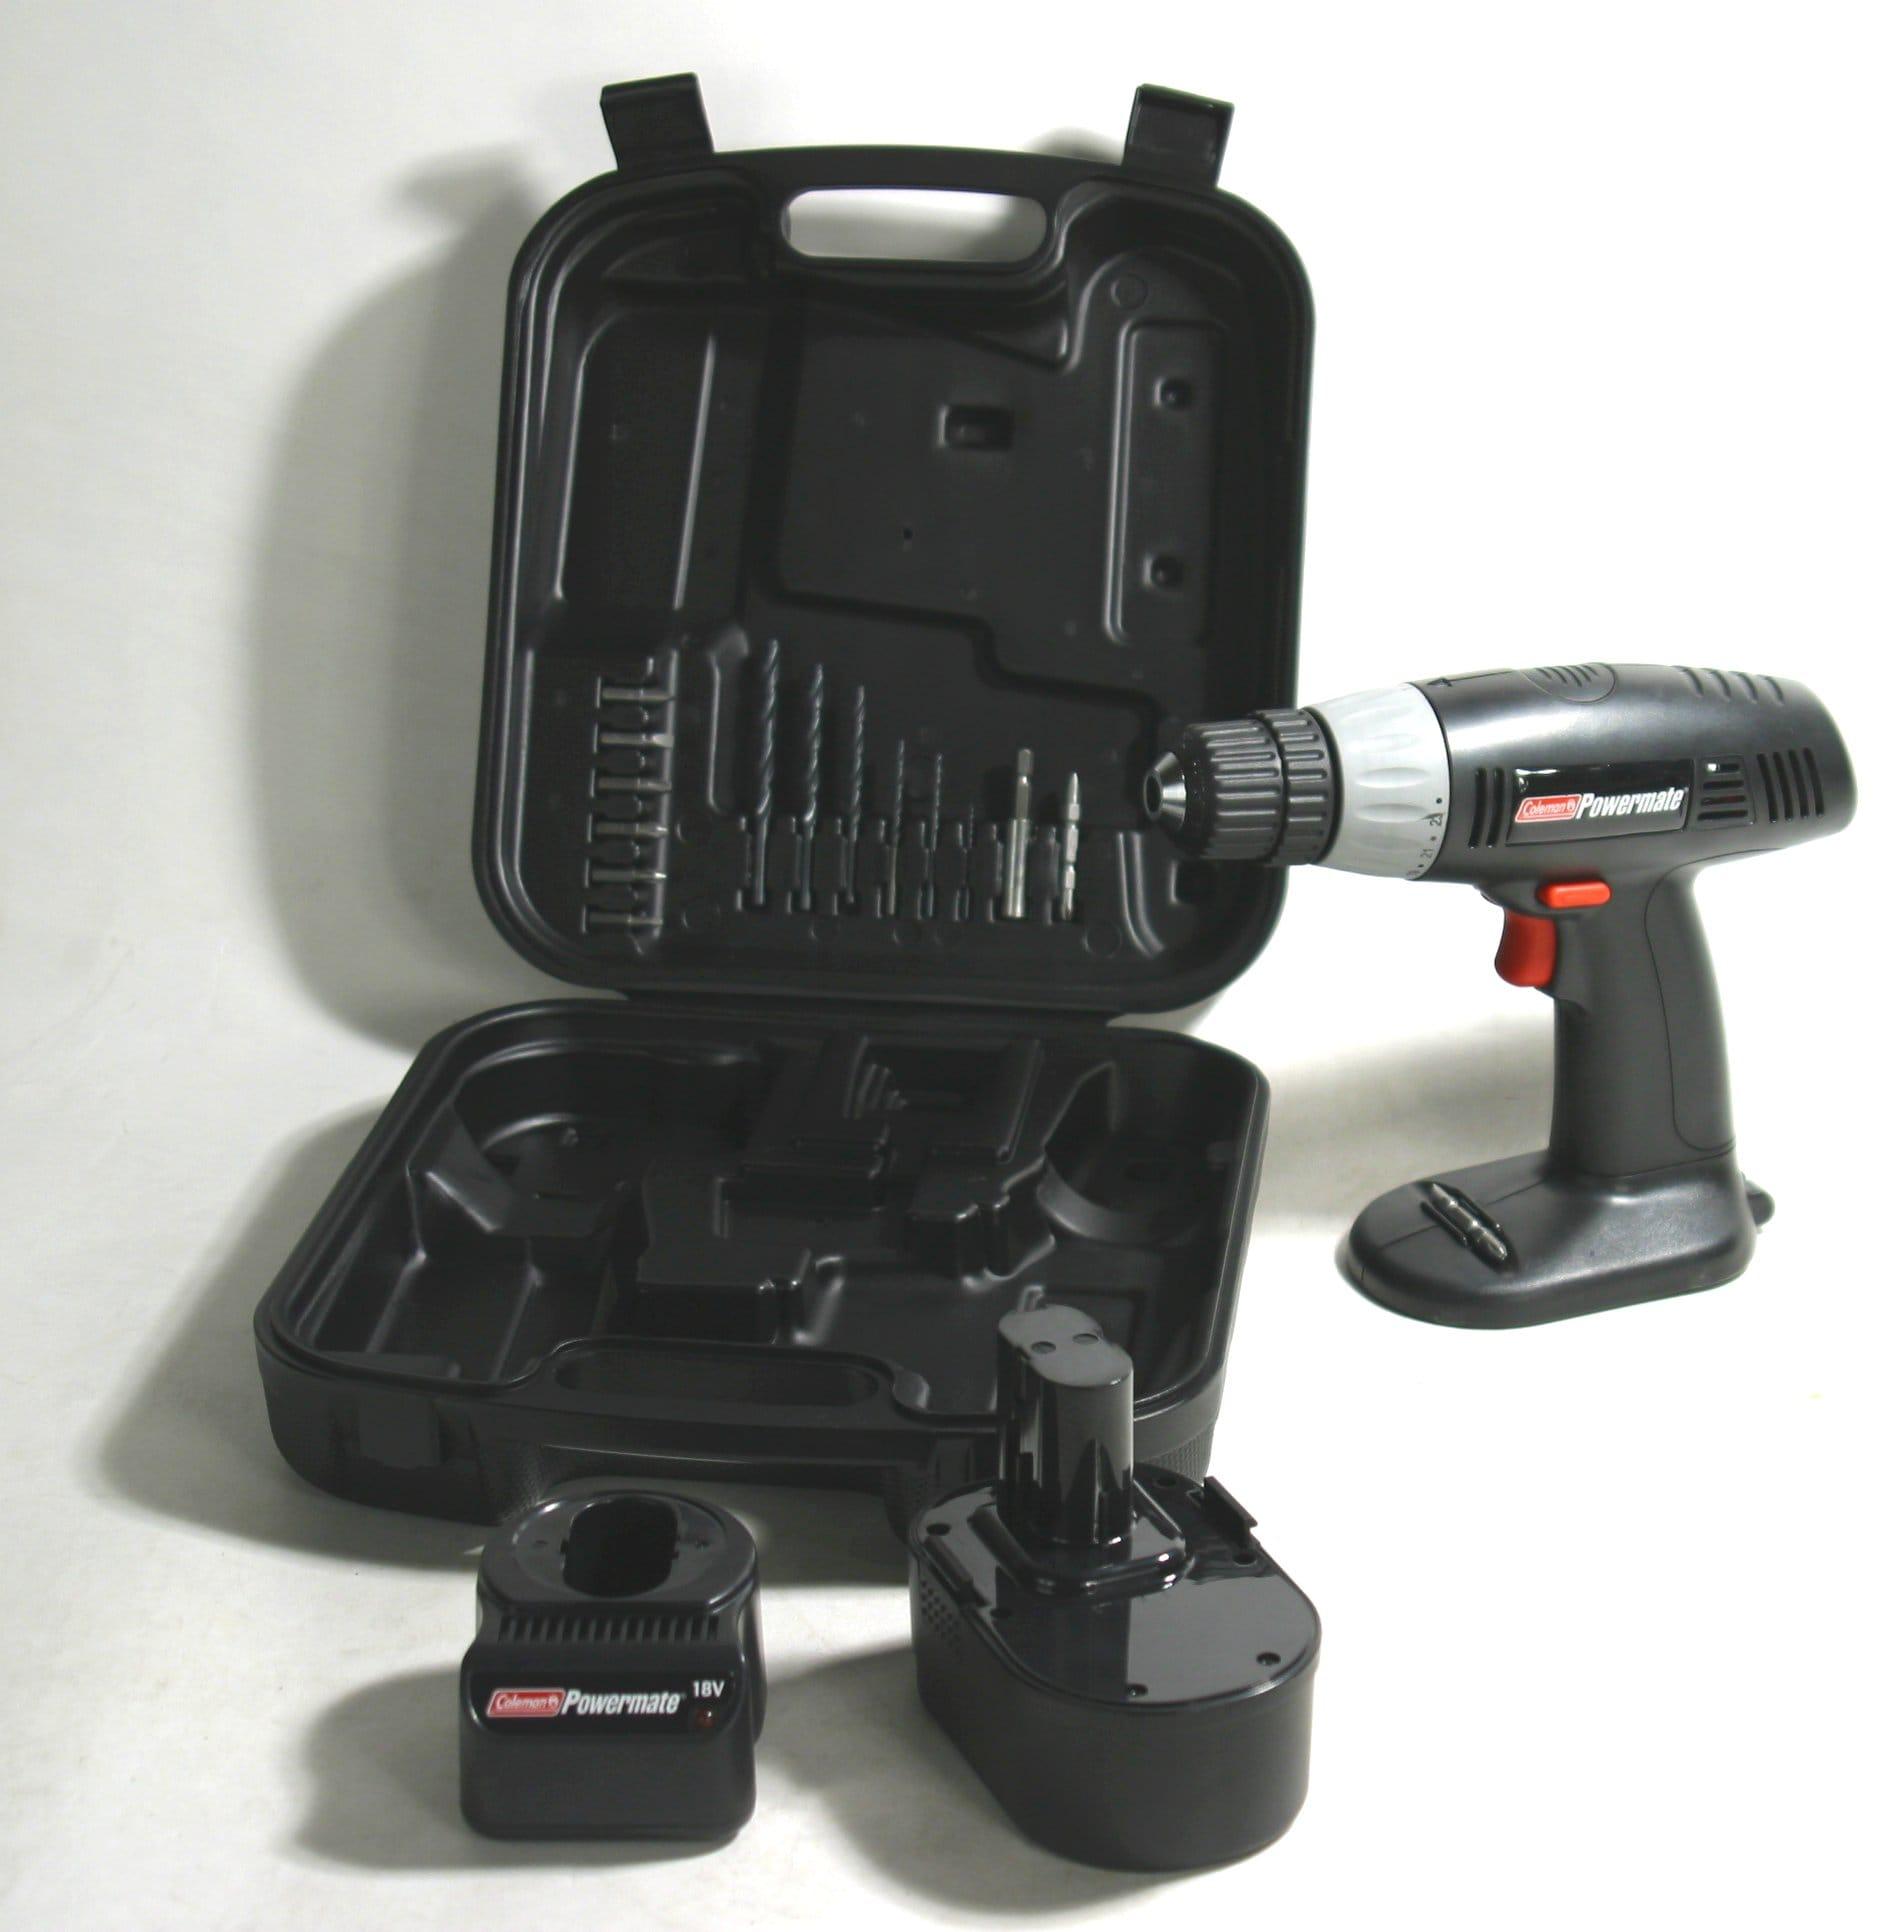 Coleman Powermate 18-volt Cordless Drill Kit